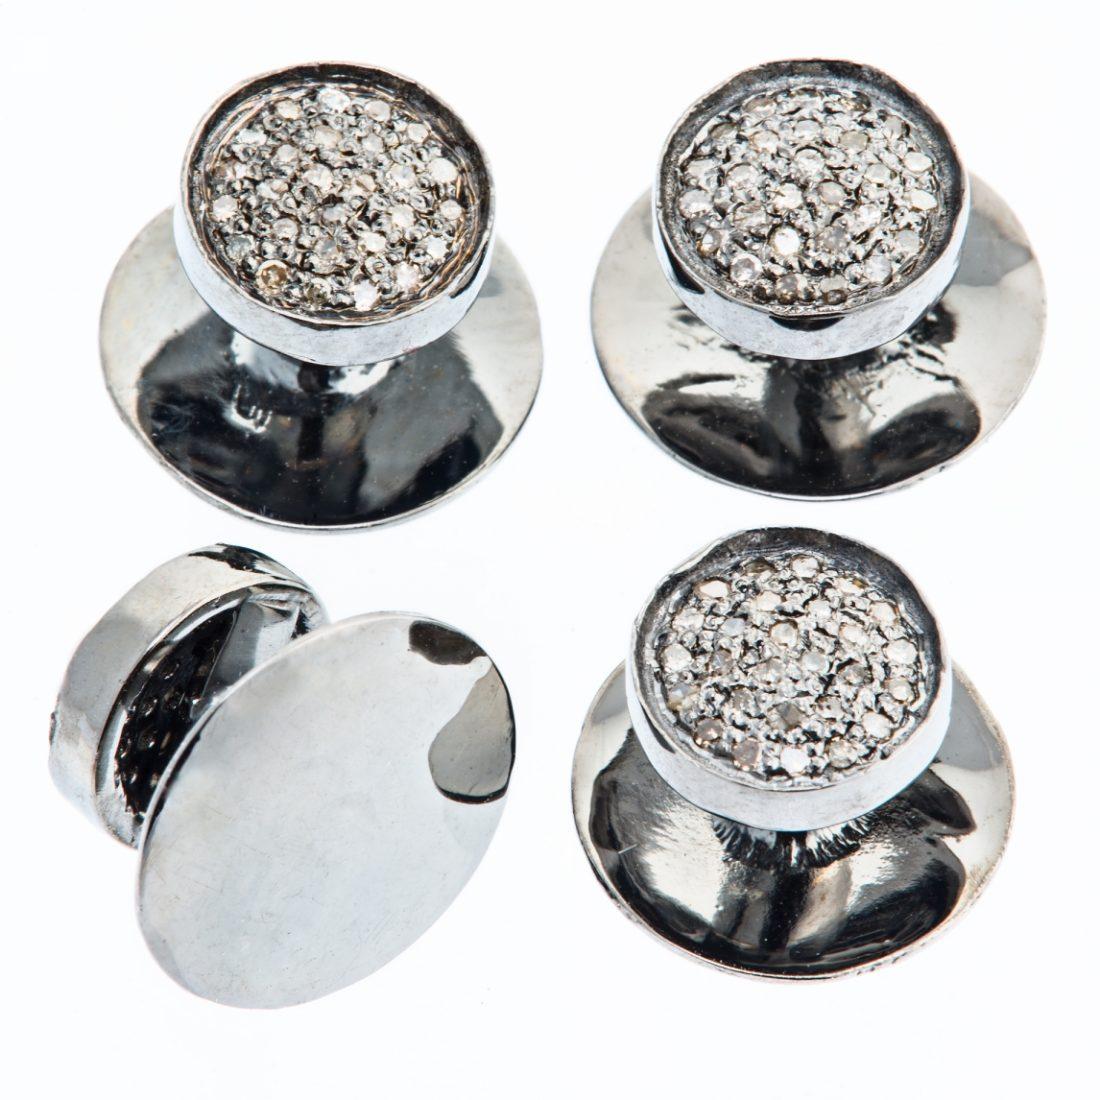 1538dstud tuxedo diamond stud set apunto jewelryapunto for Stud sets tuxedo shirts